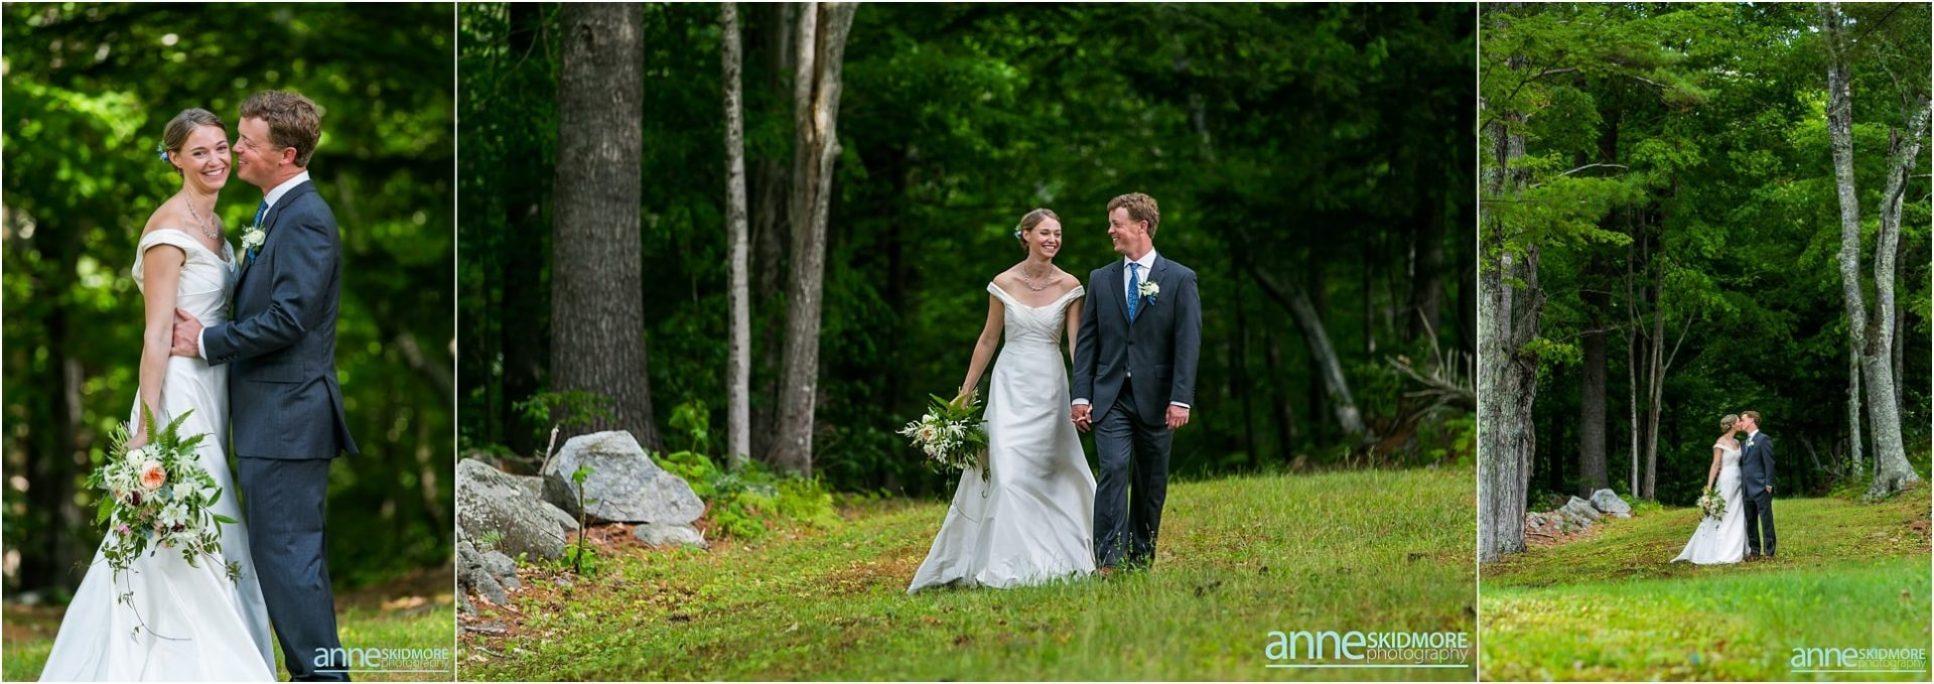 new_hampshire_wedding_photography_0028